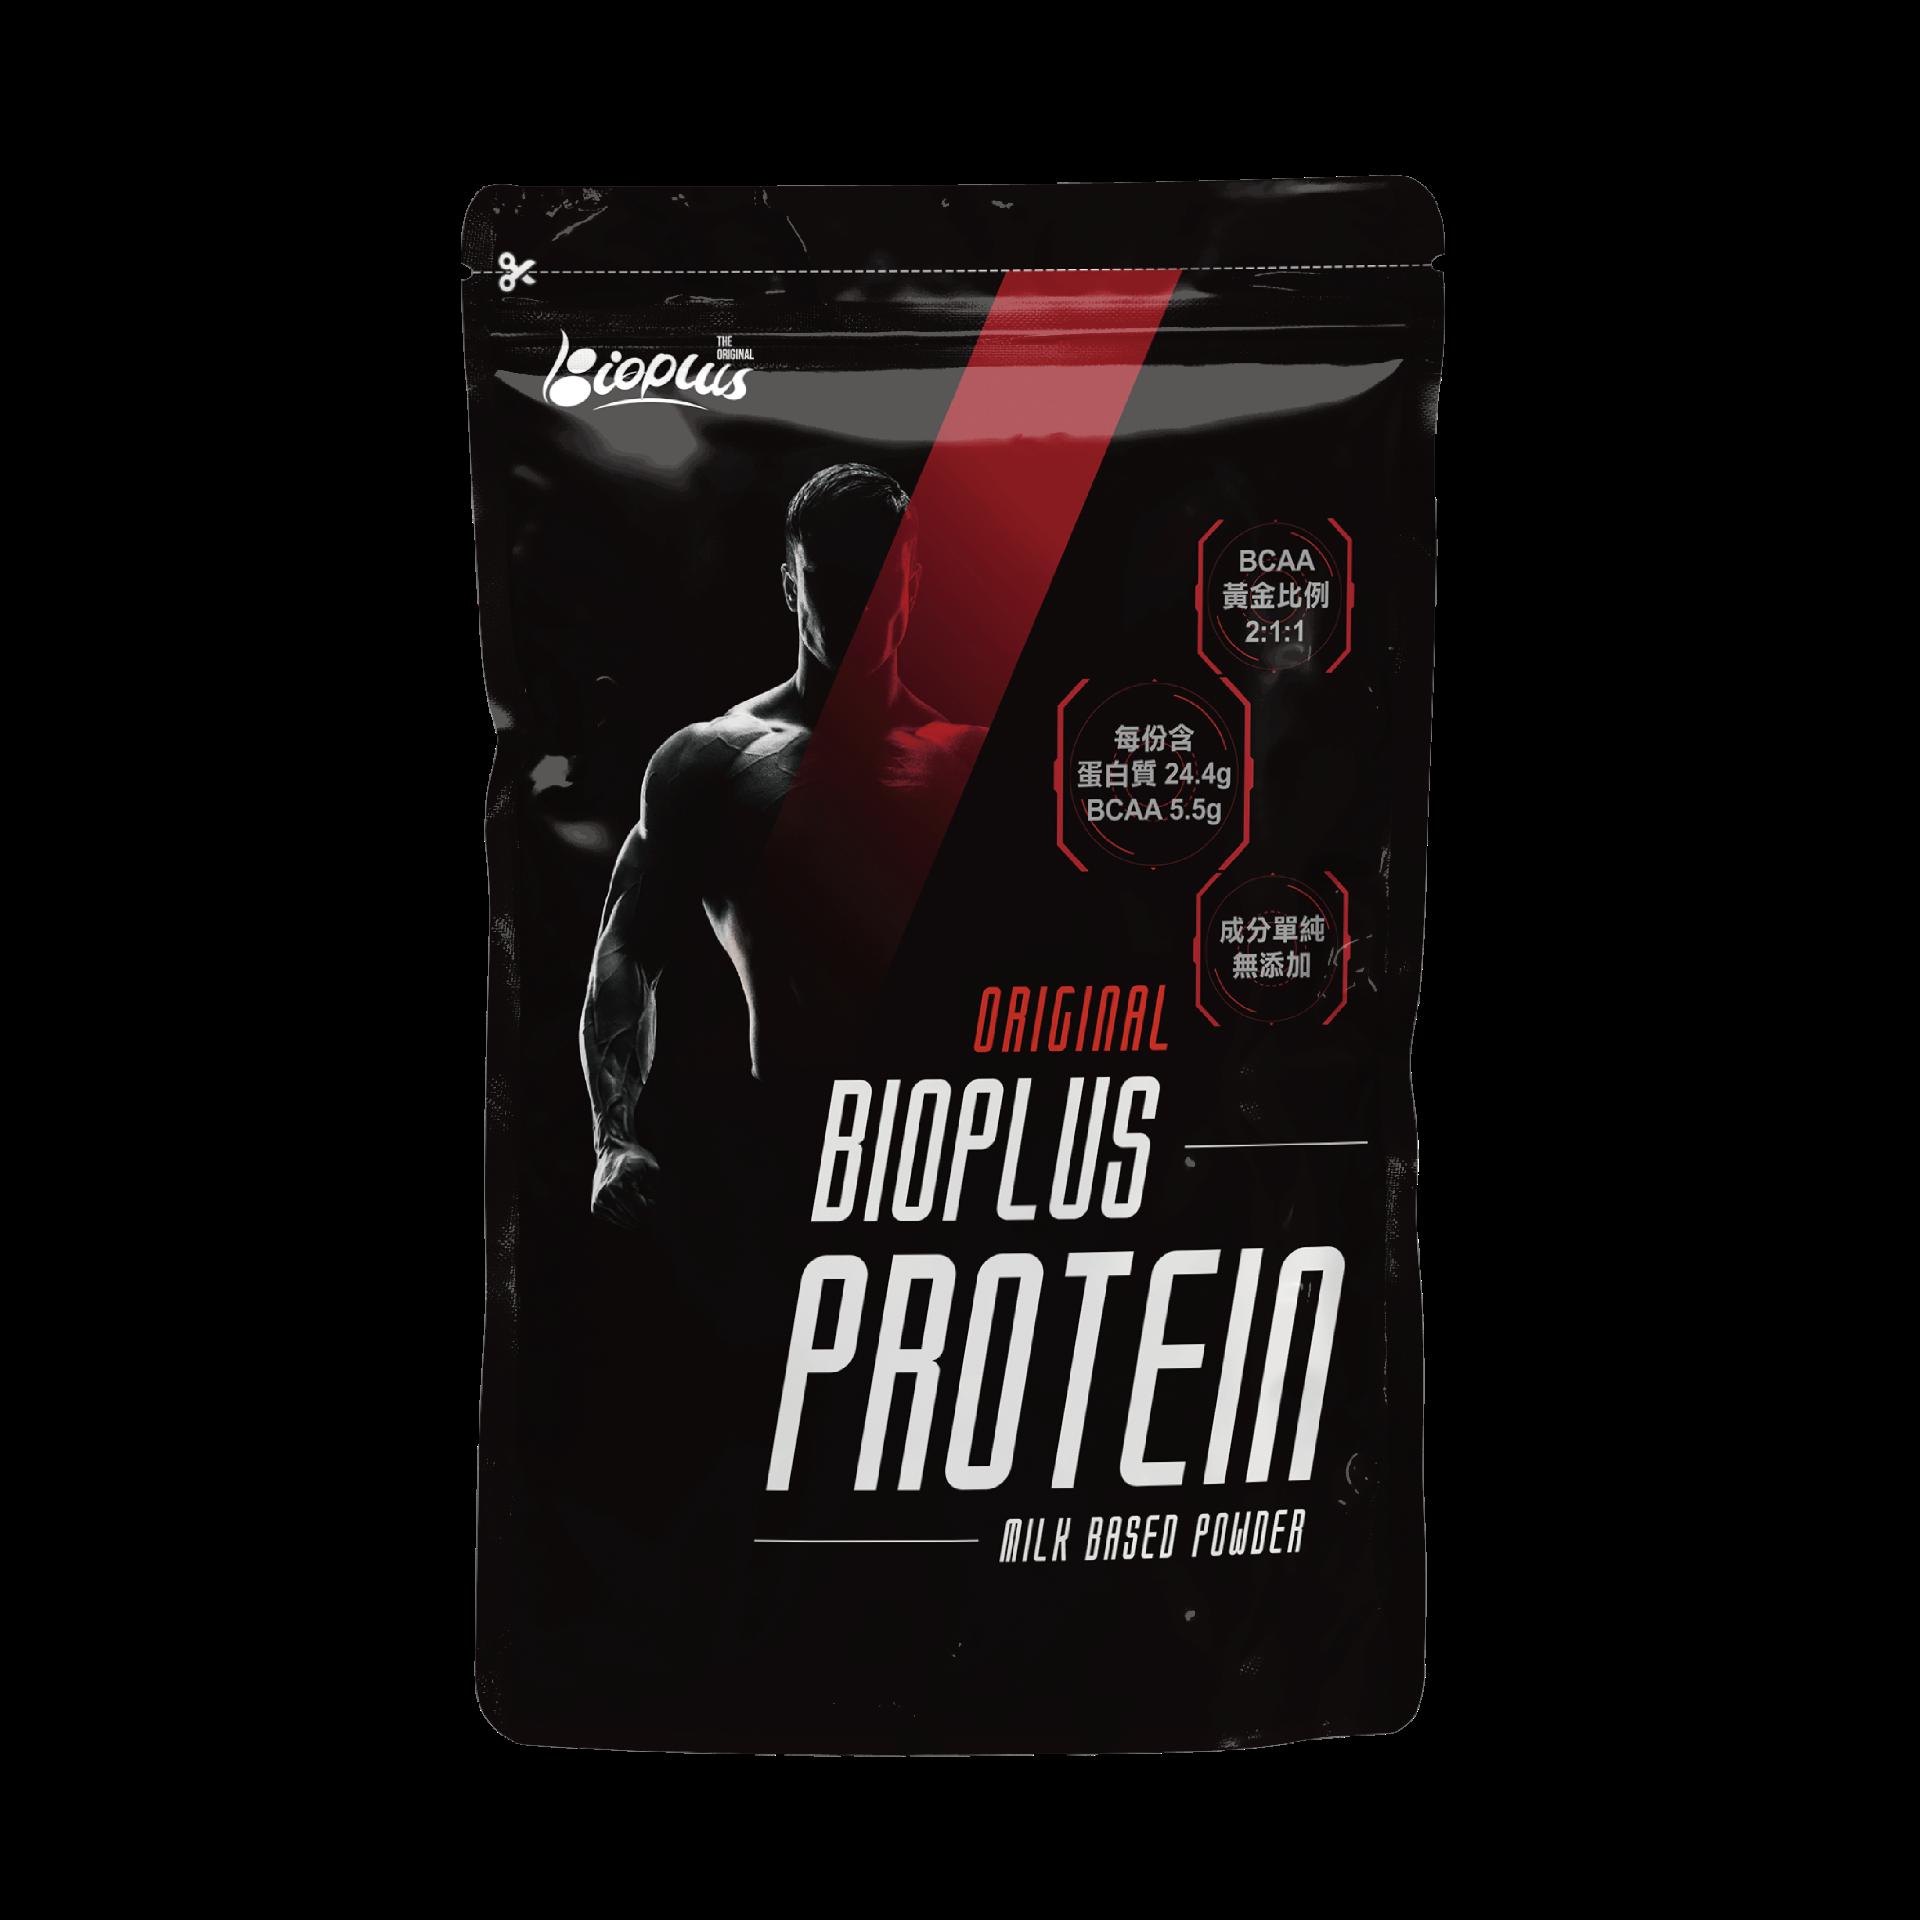 [BioPlus] 乳清蛋白(1KG/鋁袋裝) 原味